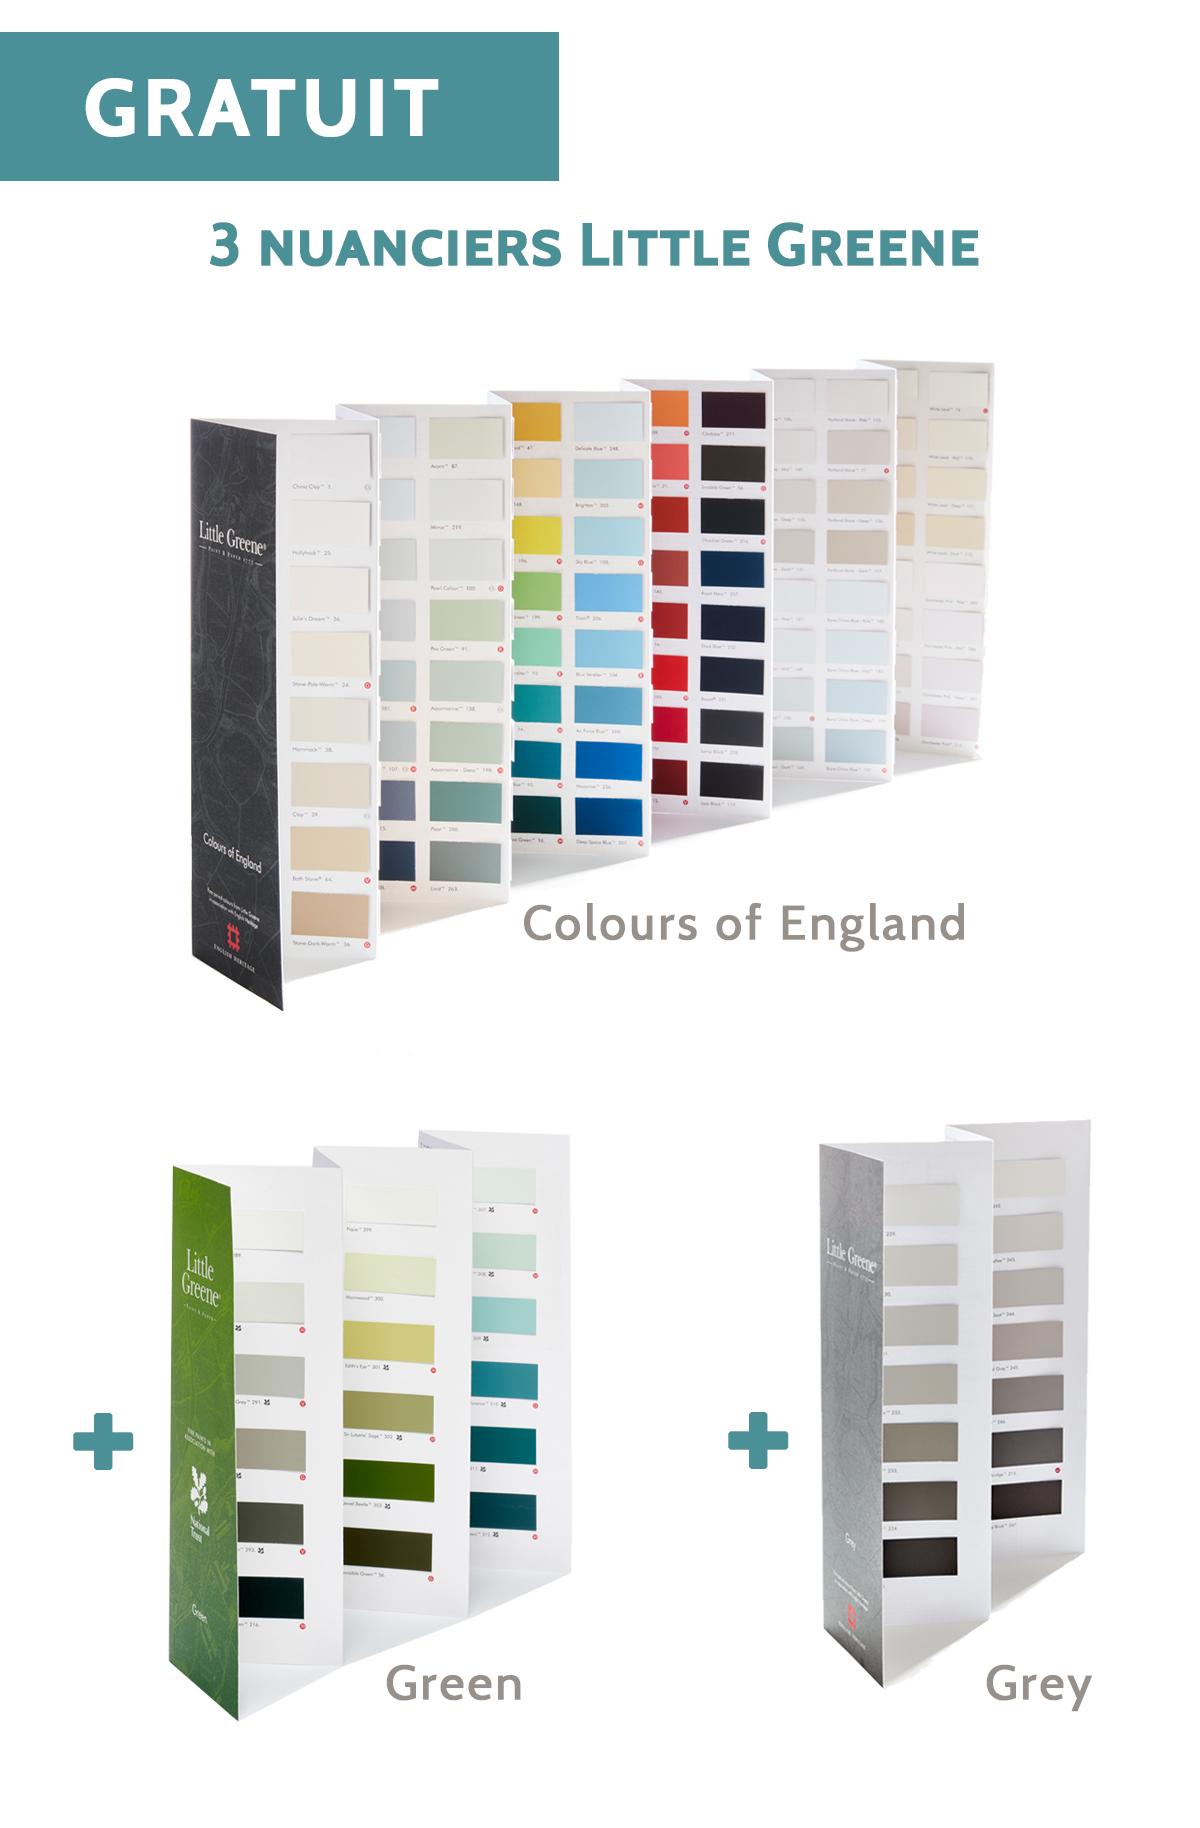 Tous les Nuanciers Little Greene - Colours of England + Grey + Greene